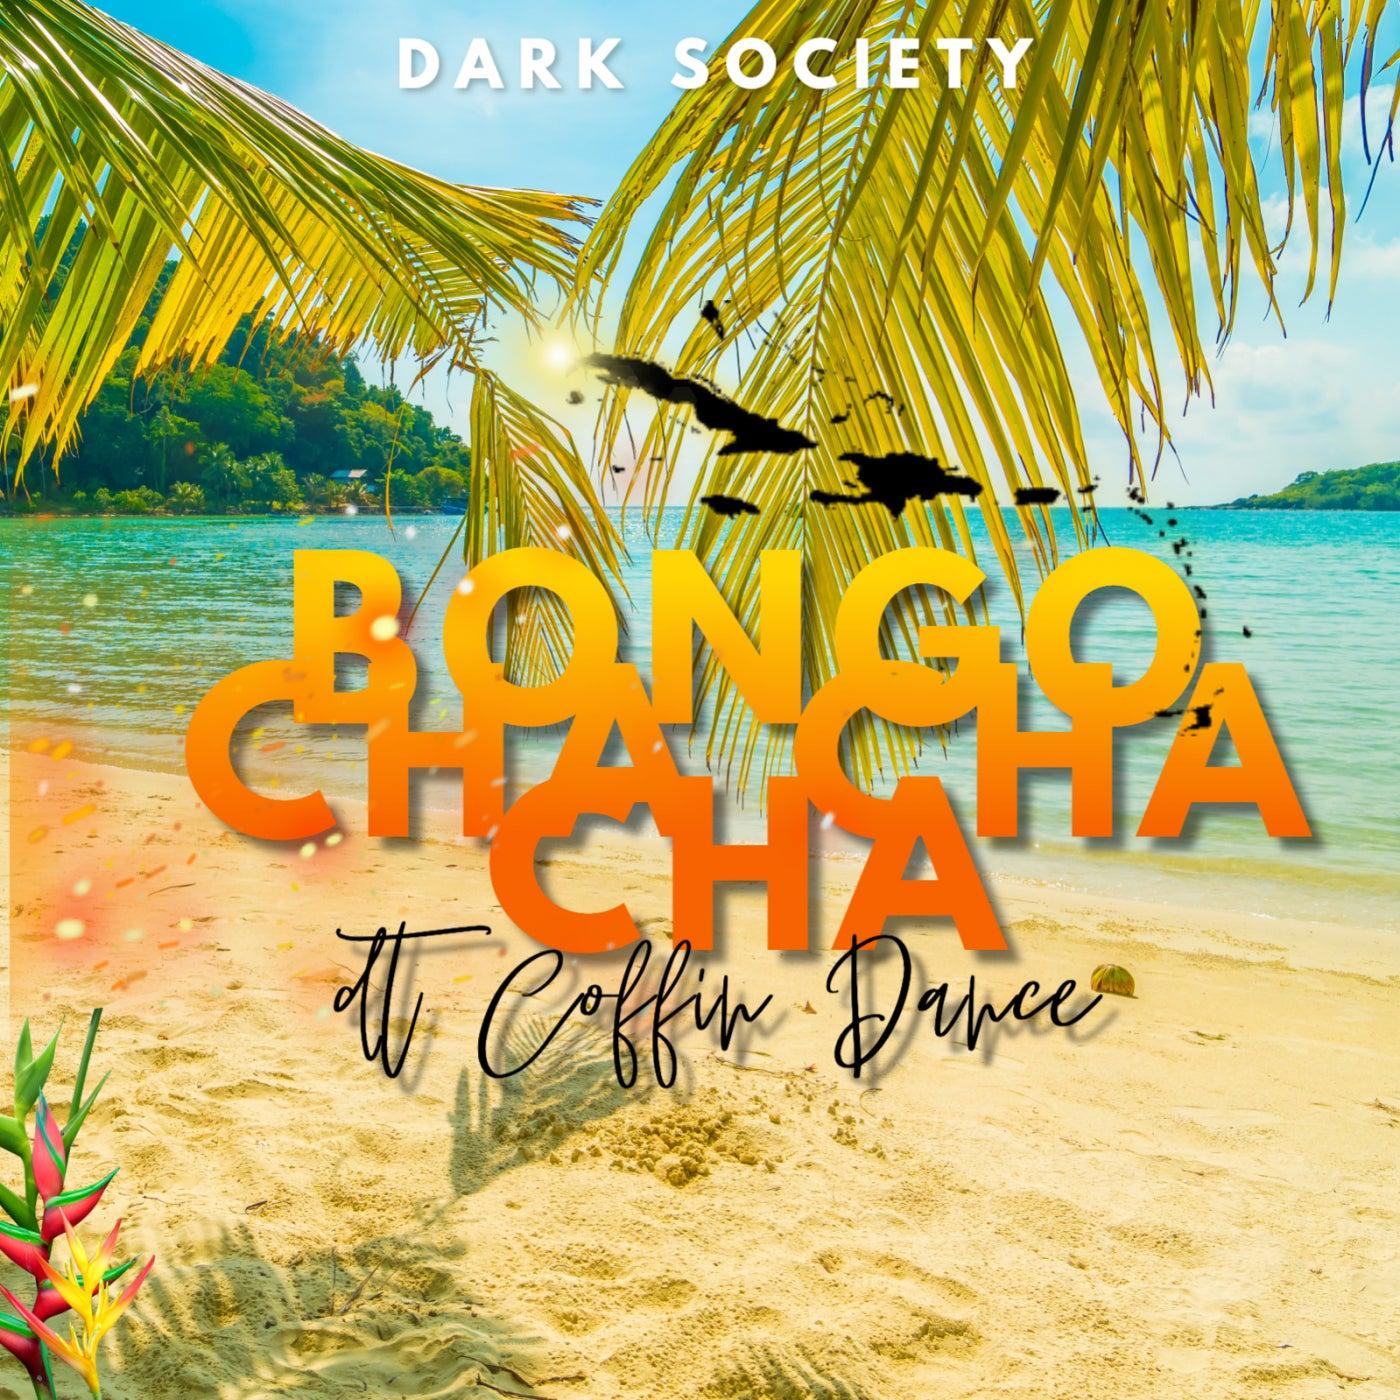 Bongo Cha Cha Cha (Bongo ChaChaCha) (Original Mix)